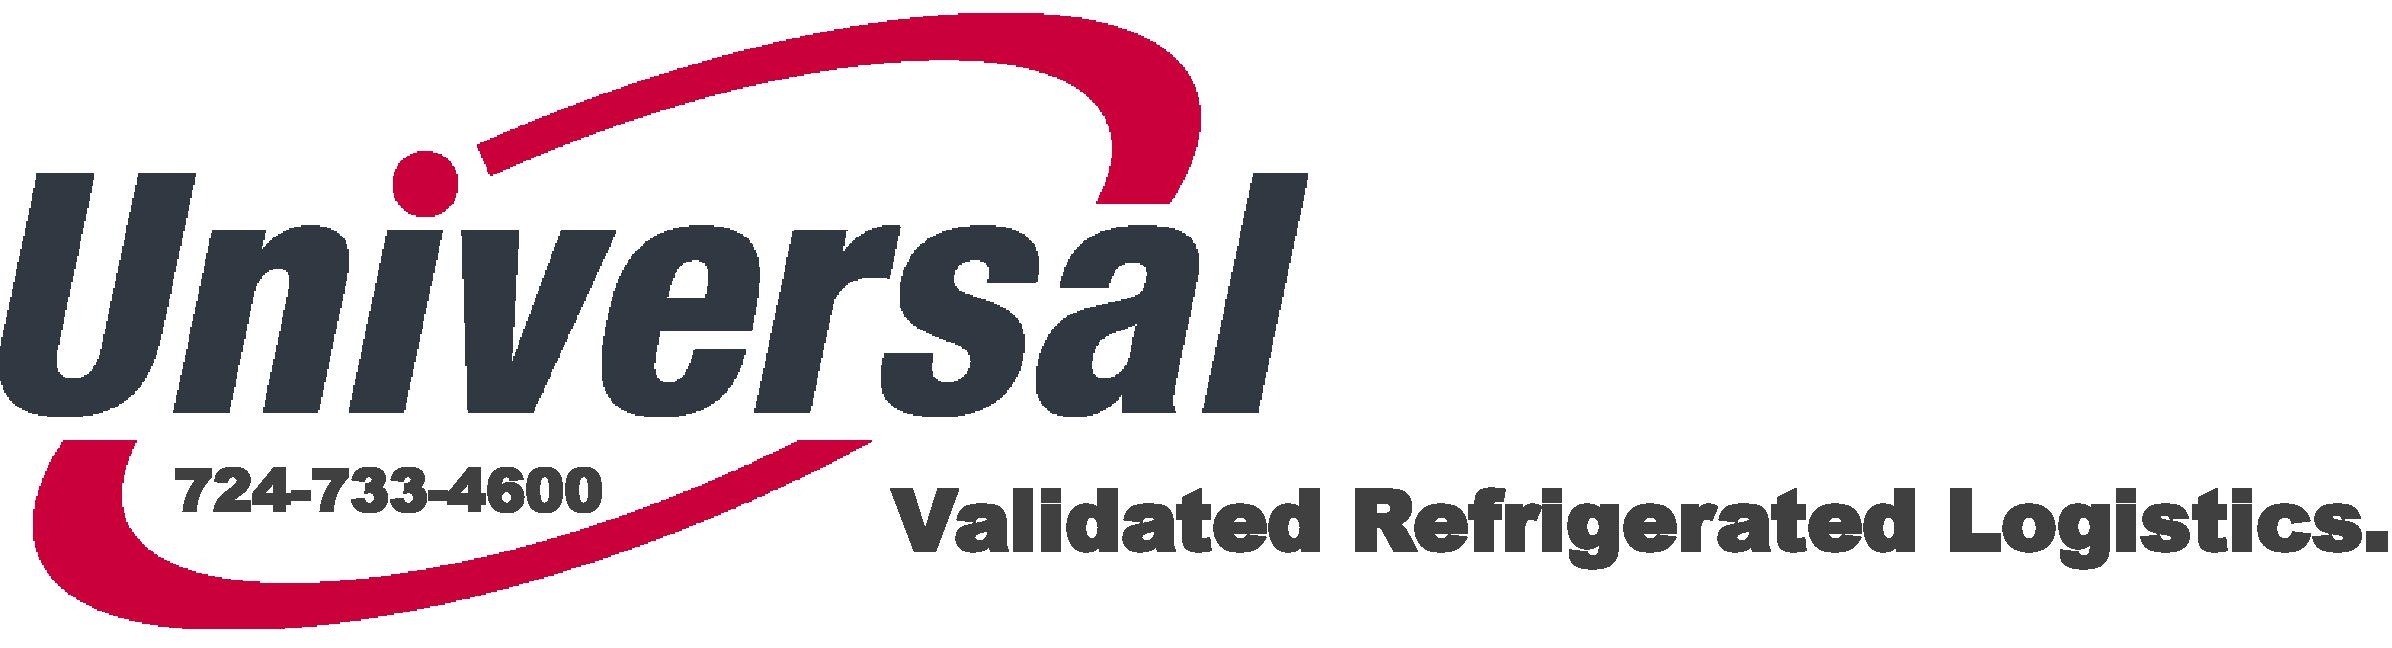 Diacast Truck logo